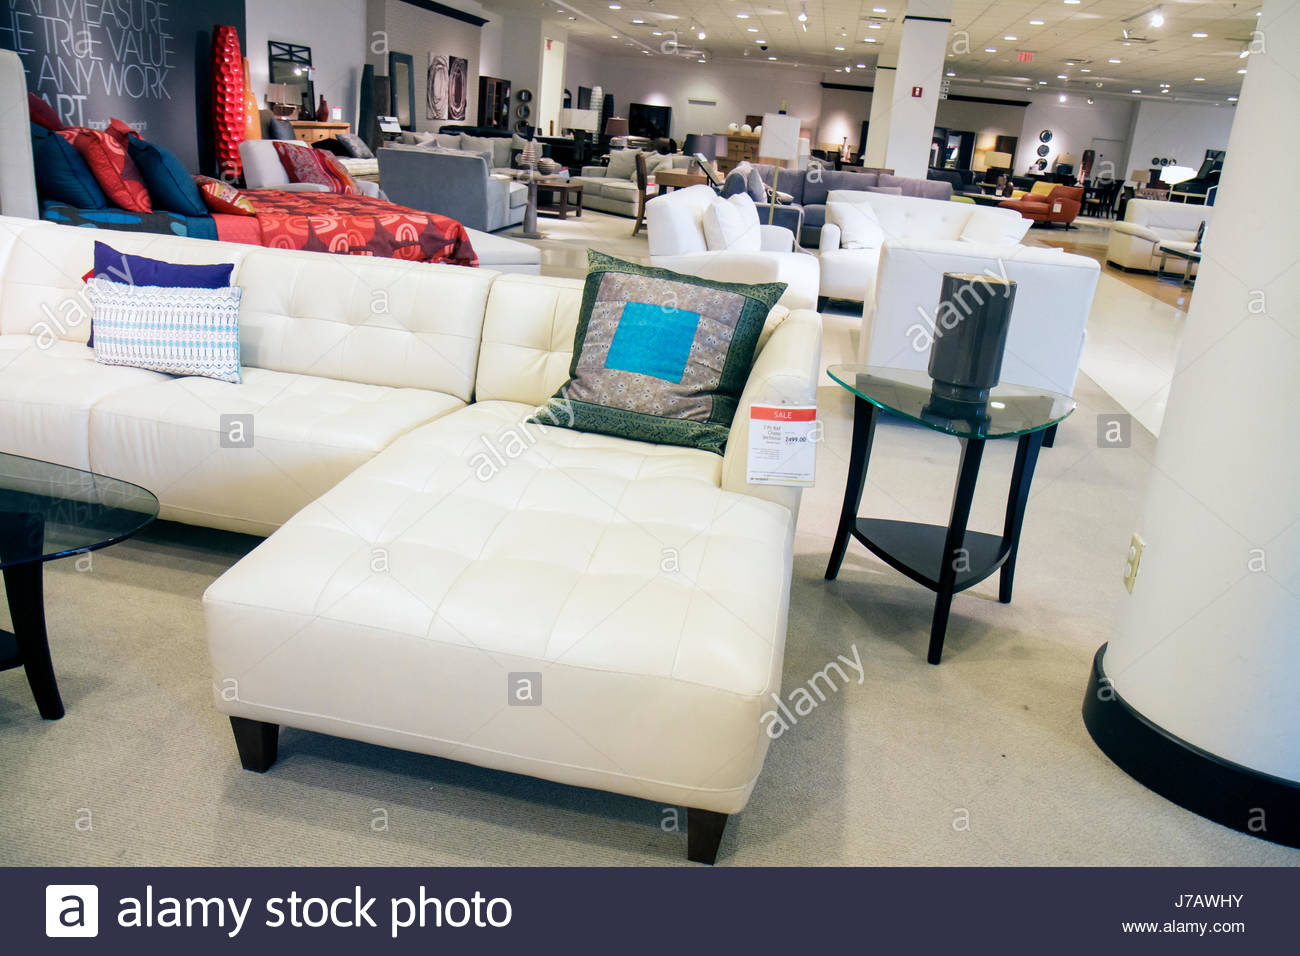 Exceptional Miami Florida Aventura Macyu0027s Department Store Furniture Sofa Retail  Display For Sale Shopping